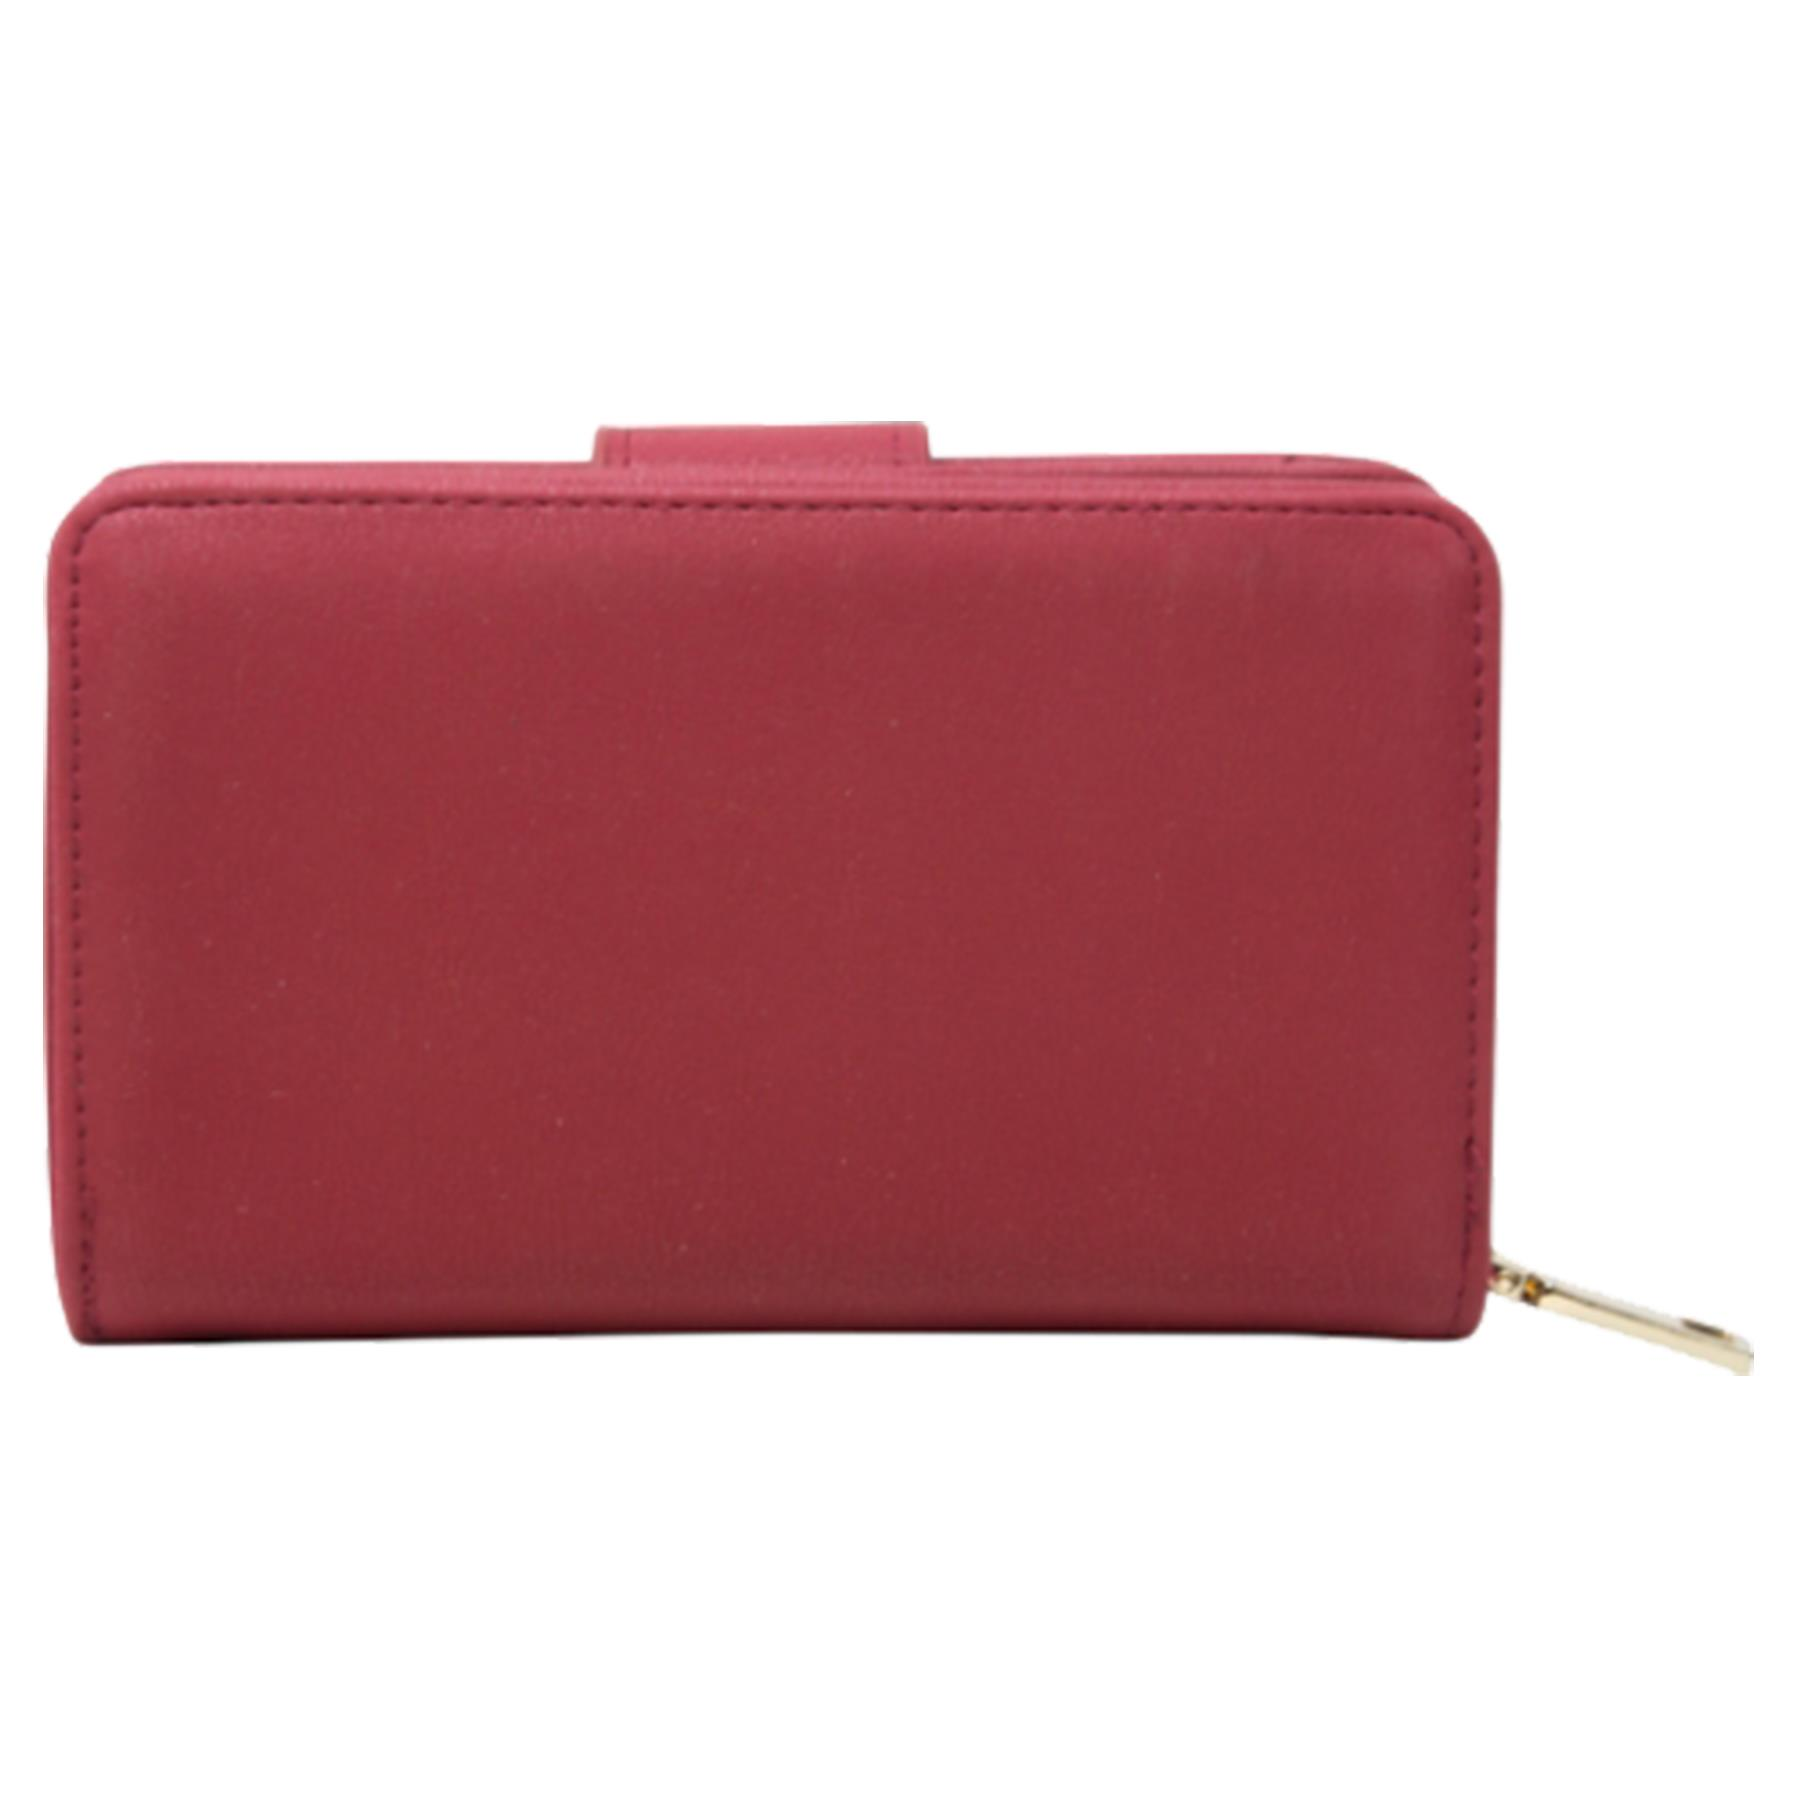 New-Ladies-Card-Slots-Zipped-Pocket-Faux-Leather-Basic-Wallet-Purse thumbnail 19